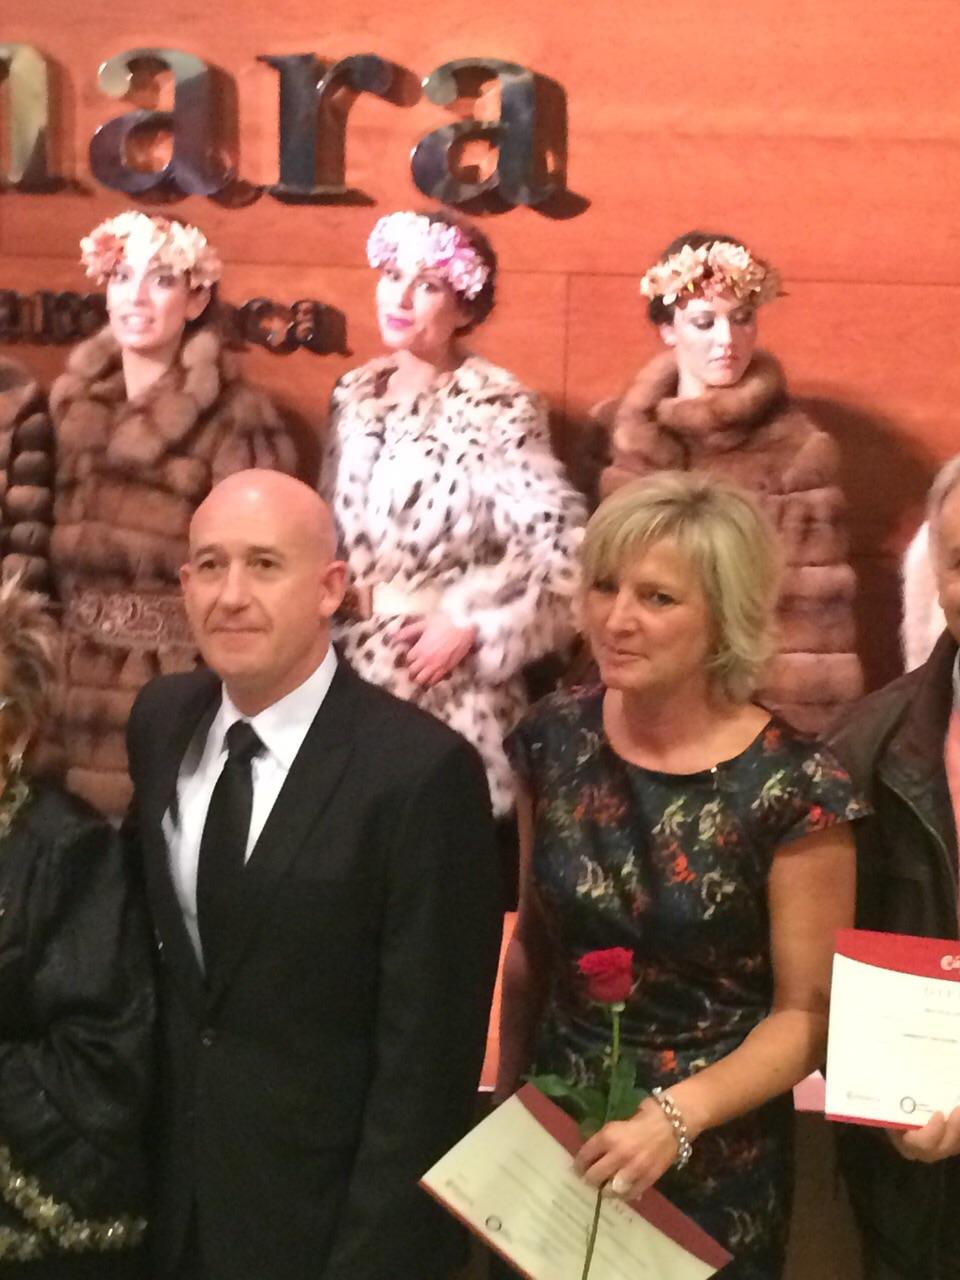 Flandes Home Interiors ganadora 1er premio de escaparate navideño - Camara de Comercio de Salamanca #3